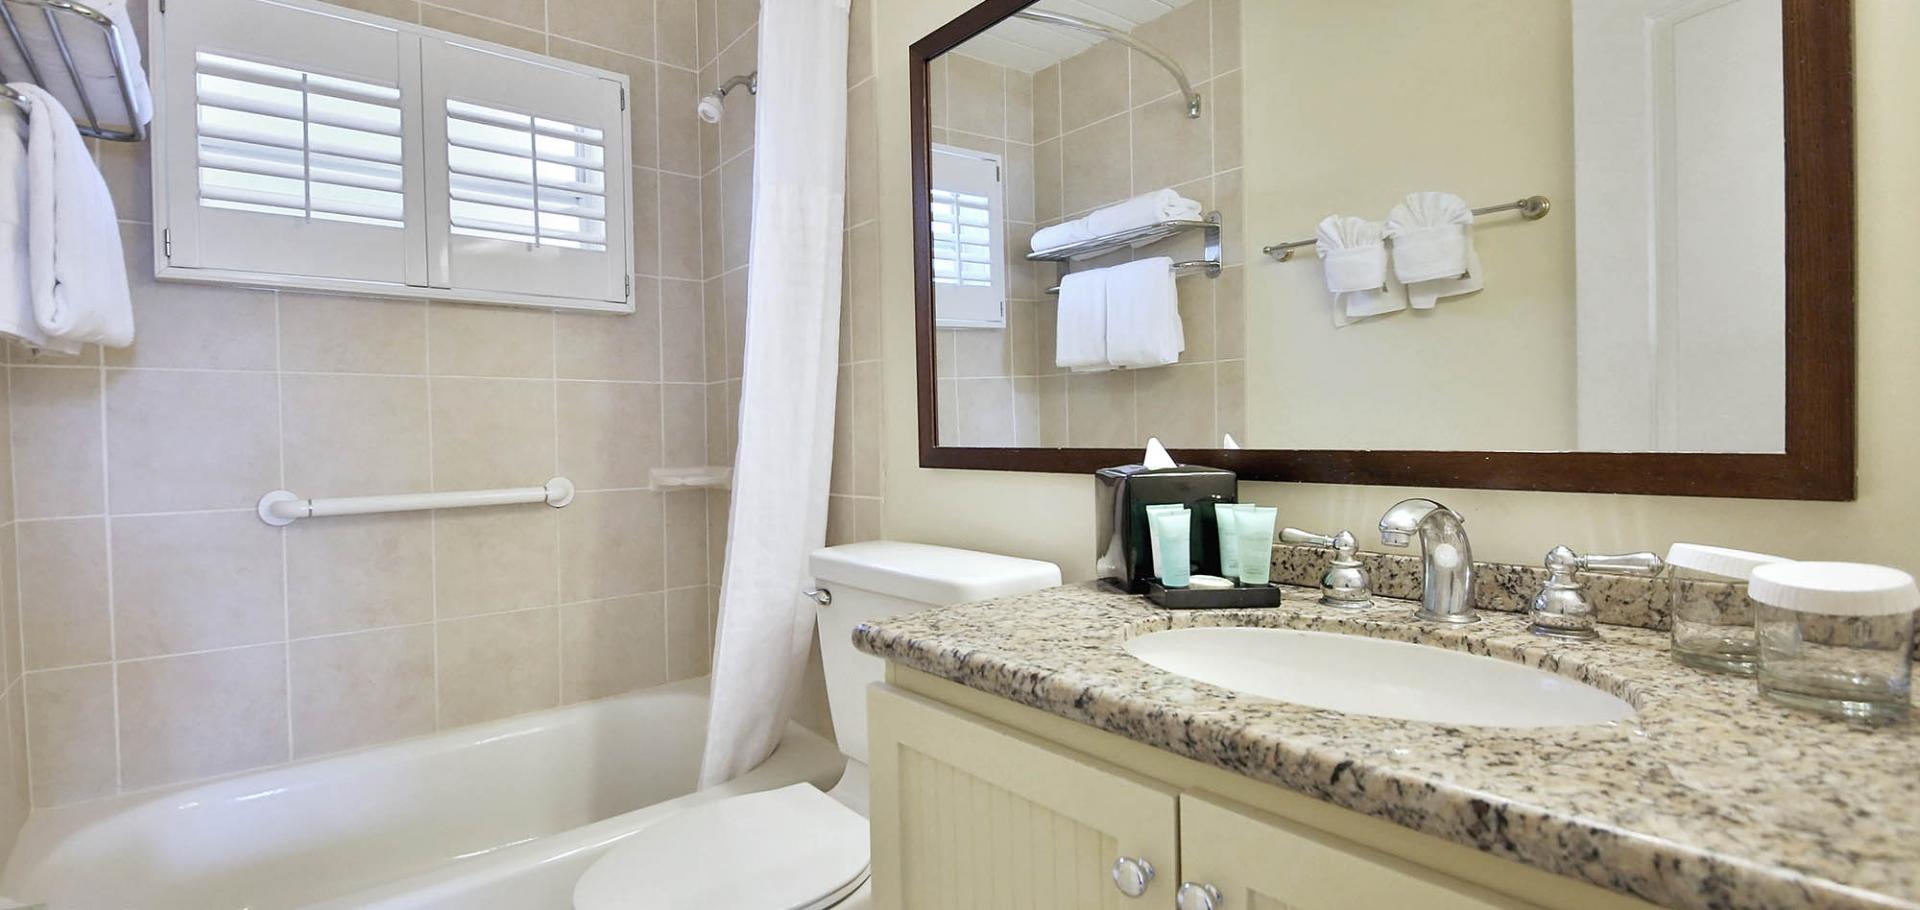 Sanibel Seaside Inn Bathroom